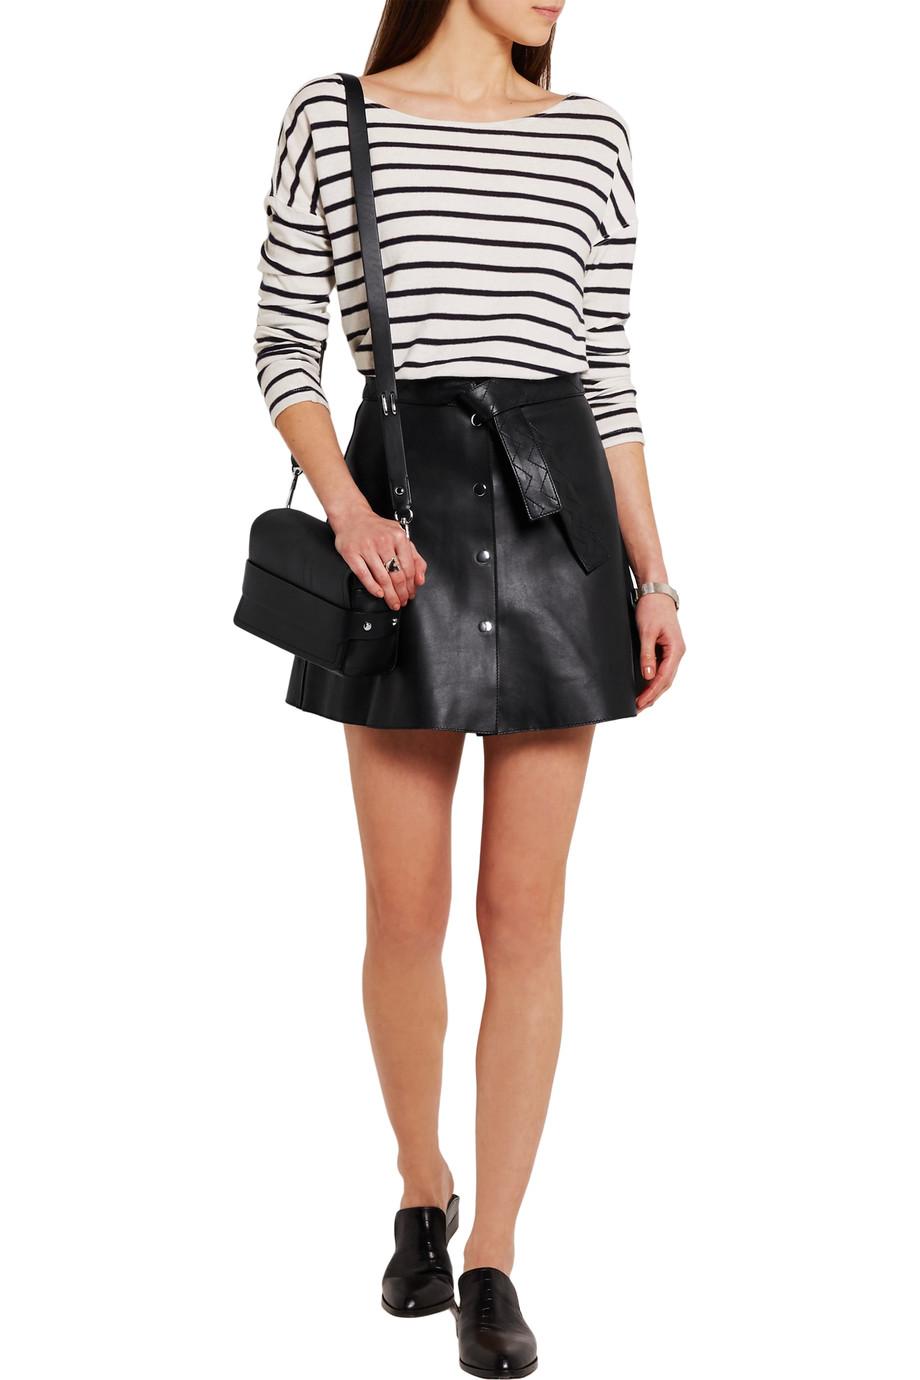 https-::www.theoutnet.com:en-US:Shop:Product:Maje:Belted-leather-mini-skirt:686954.jpg